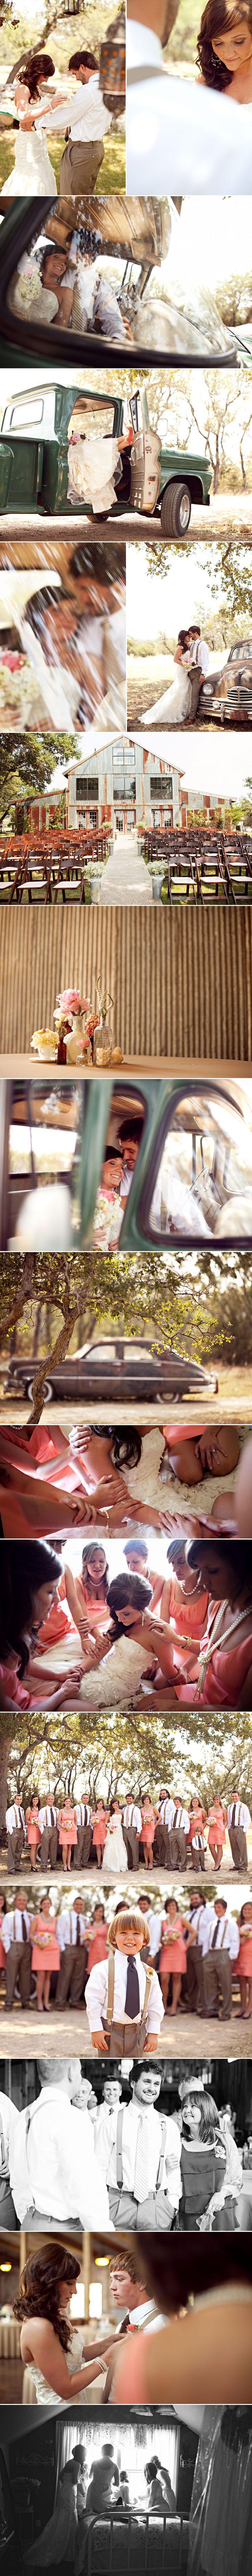 katie + john | wedding | austin wedding photographer | ee photography love the old car